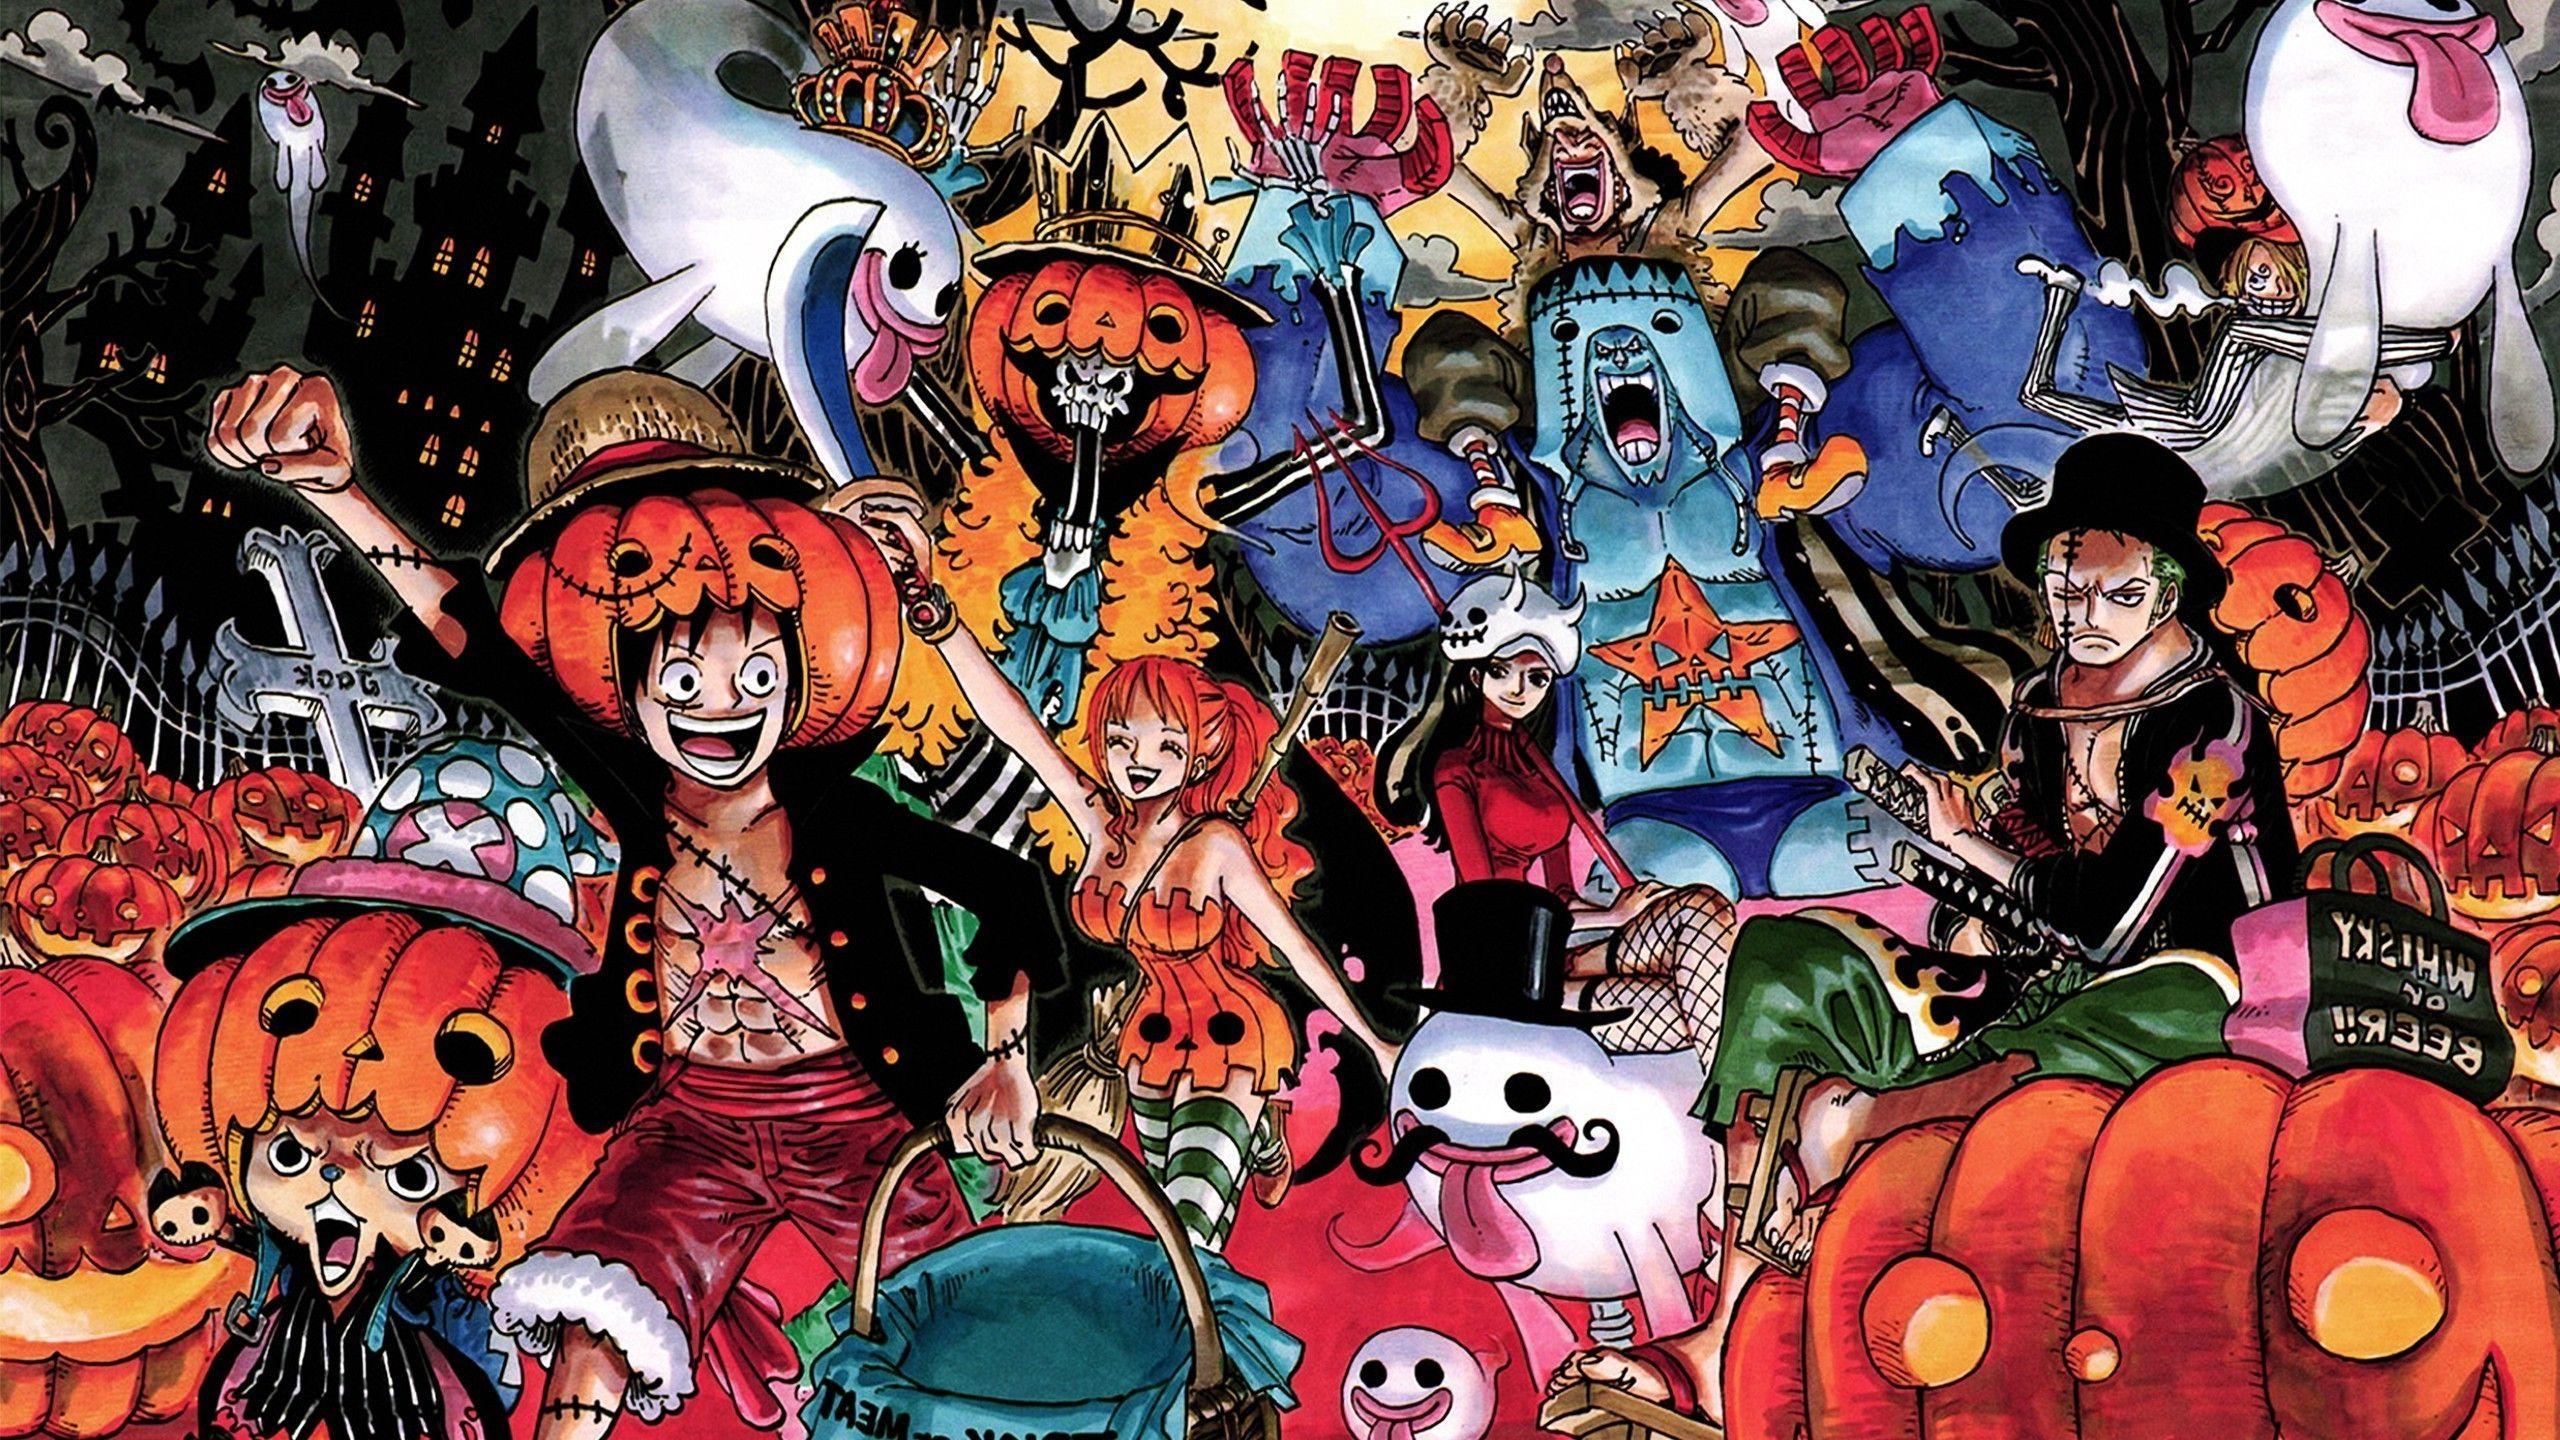 Wallpaper One Piece Hd Untuk Laptop Zoro Wallpaper Hd 64 Images One Piece Wallpapers Manga Anime One Piece Anime Wallpaper 1920x1080 Android Wallpaper Anime Anime wallpaper hd new tab themes